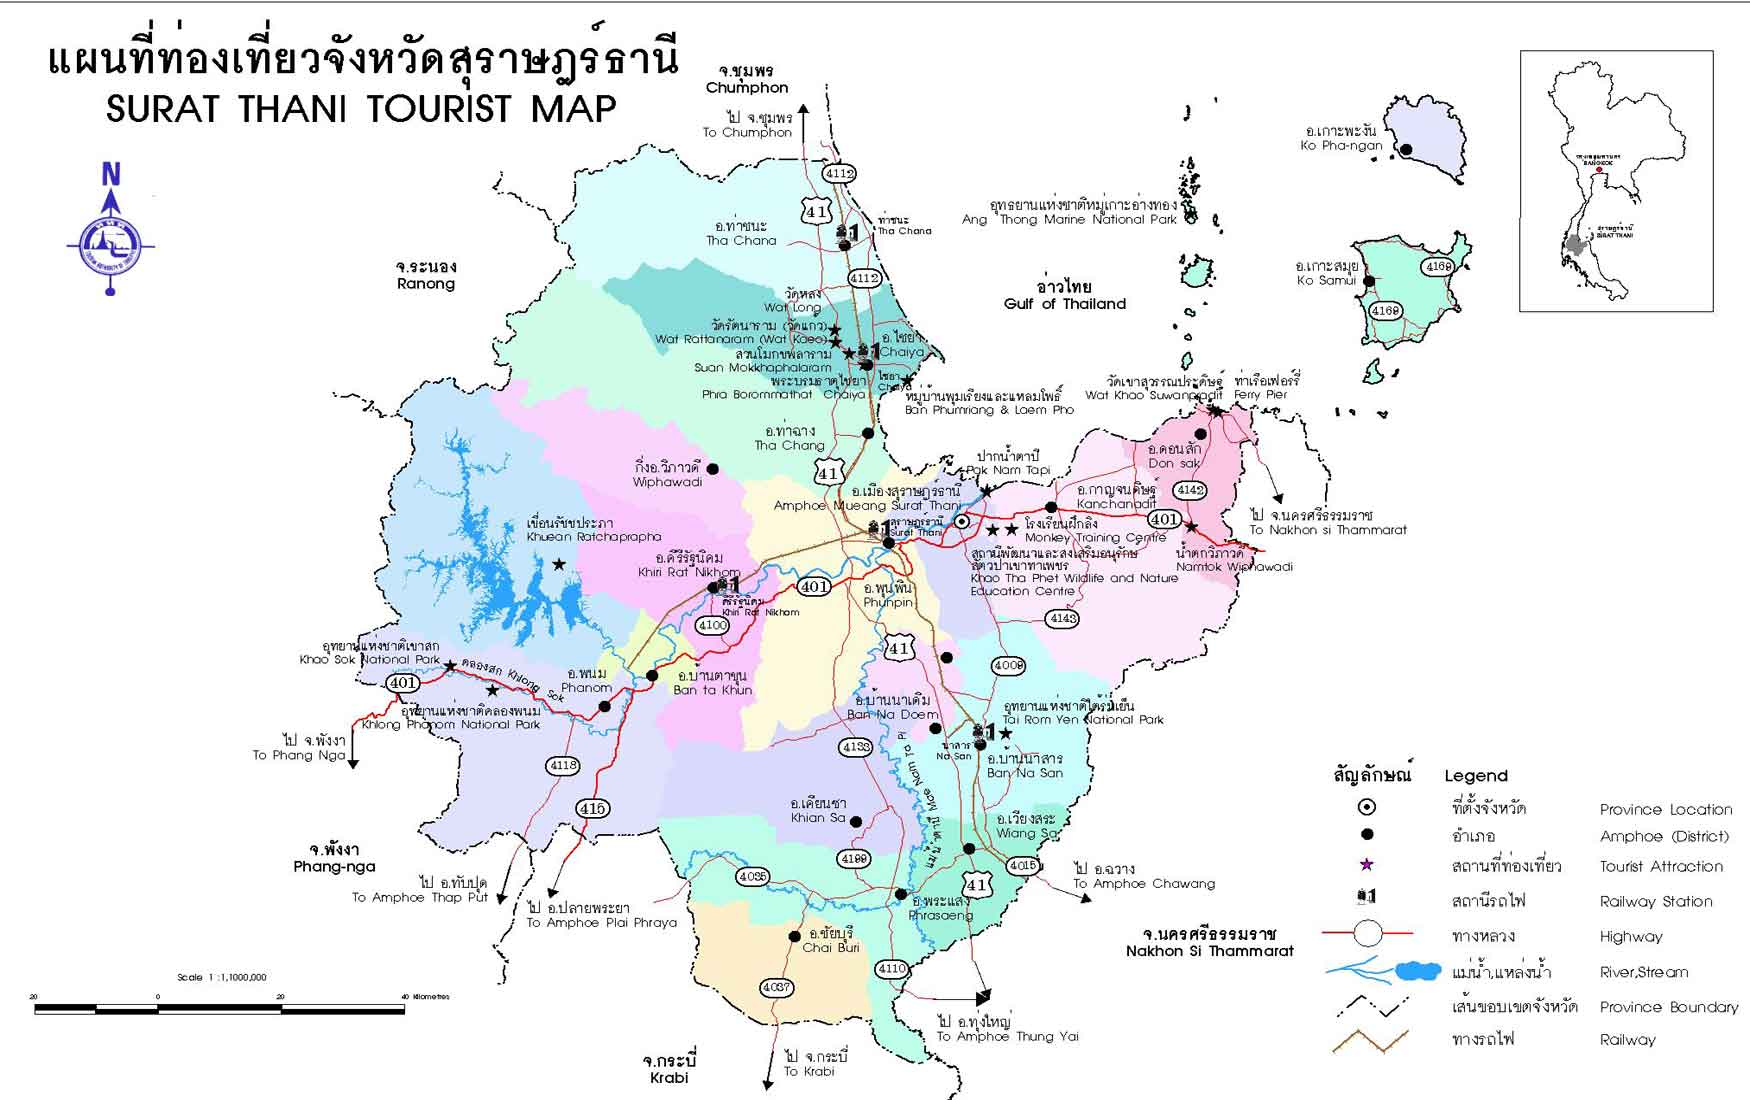 Thailand Tourist Map Thailand mappery